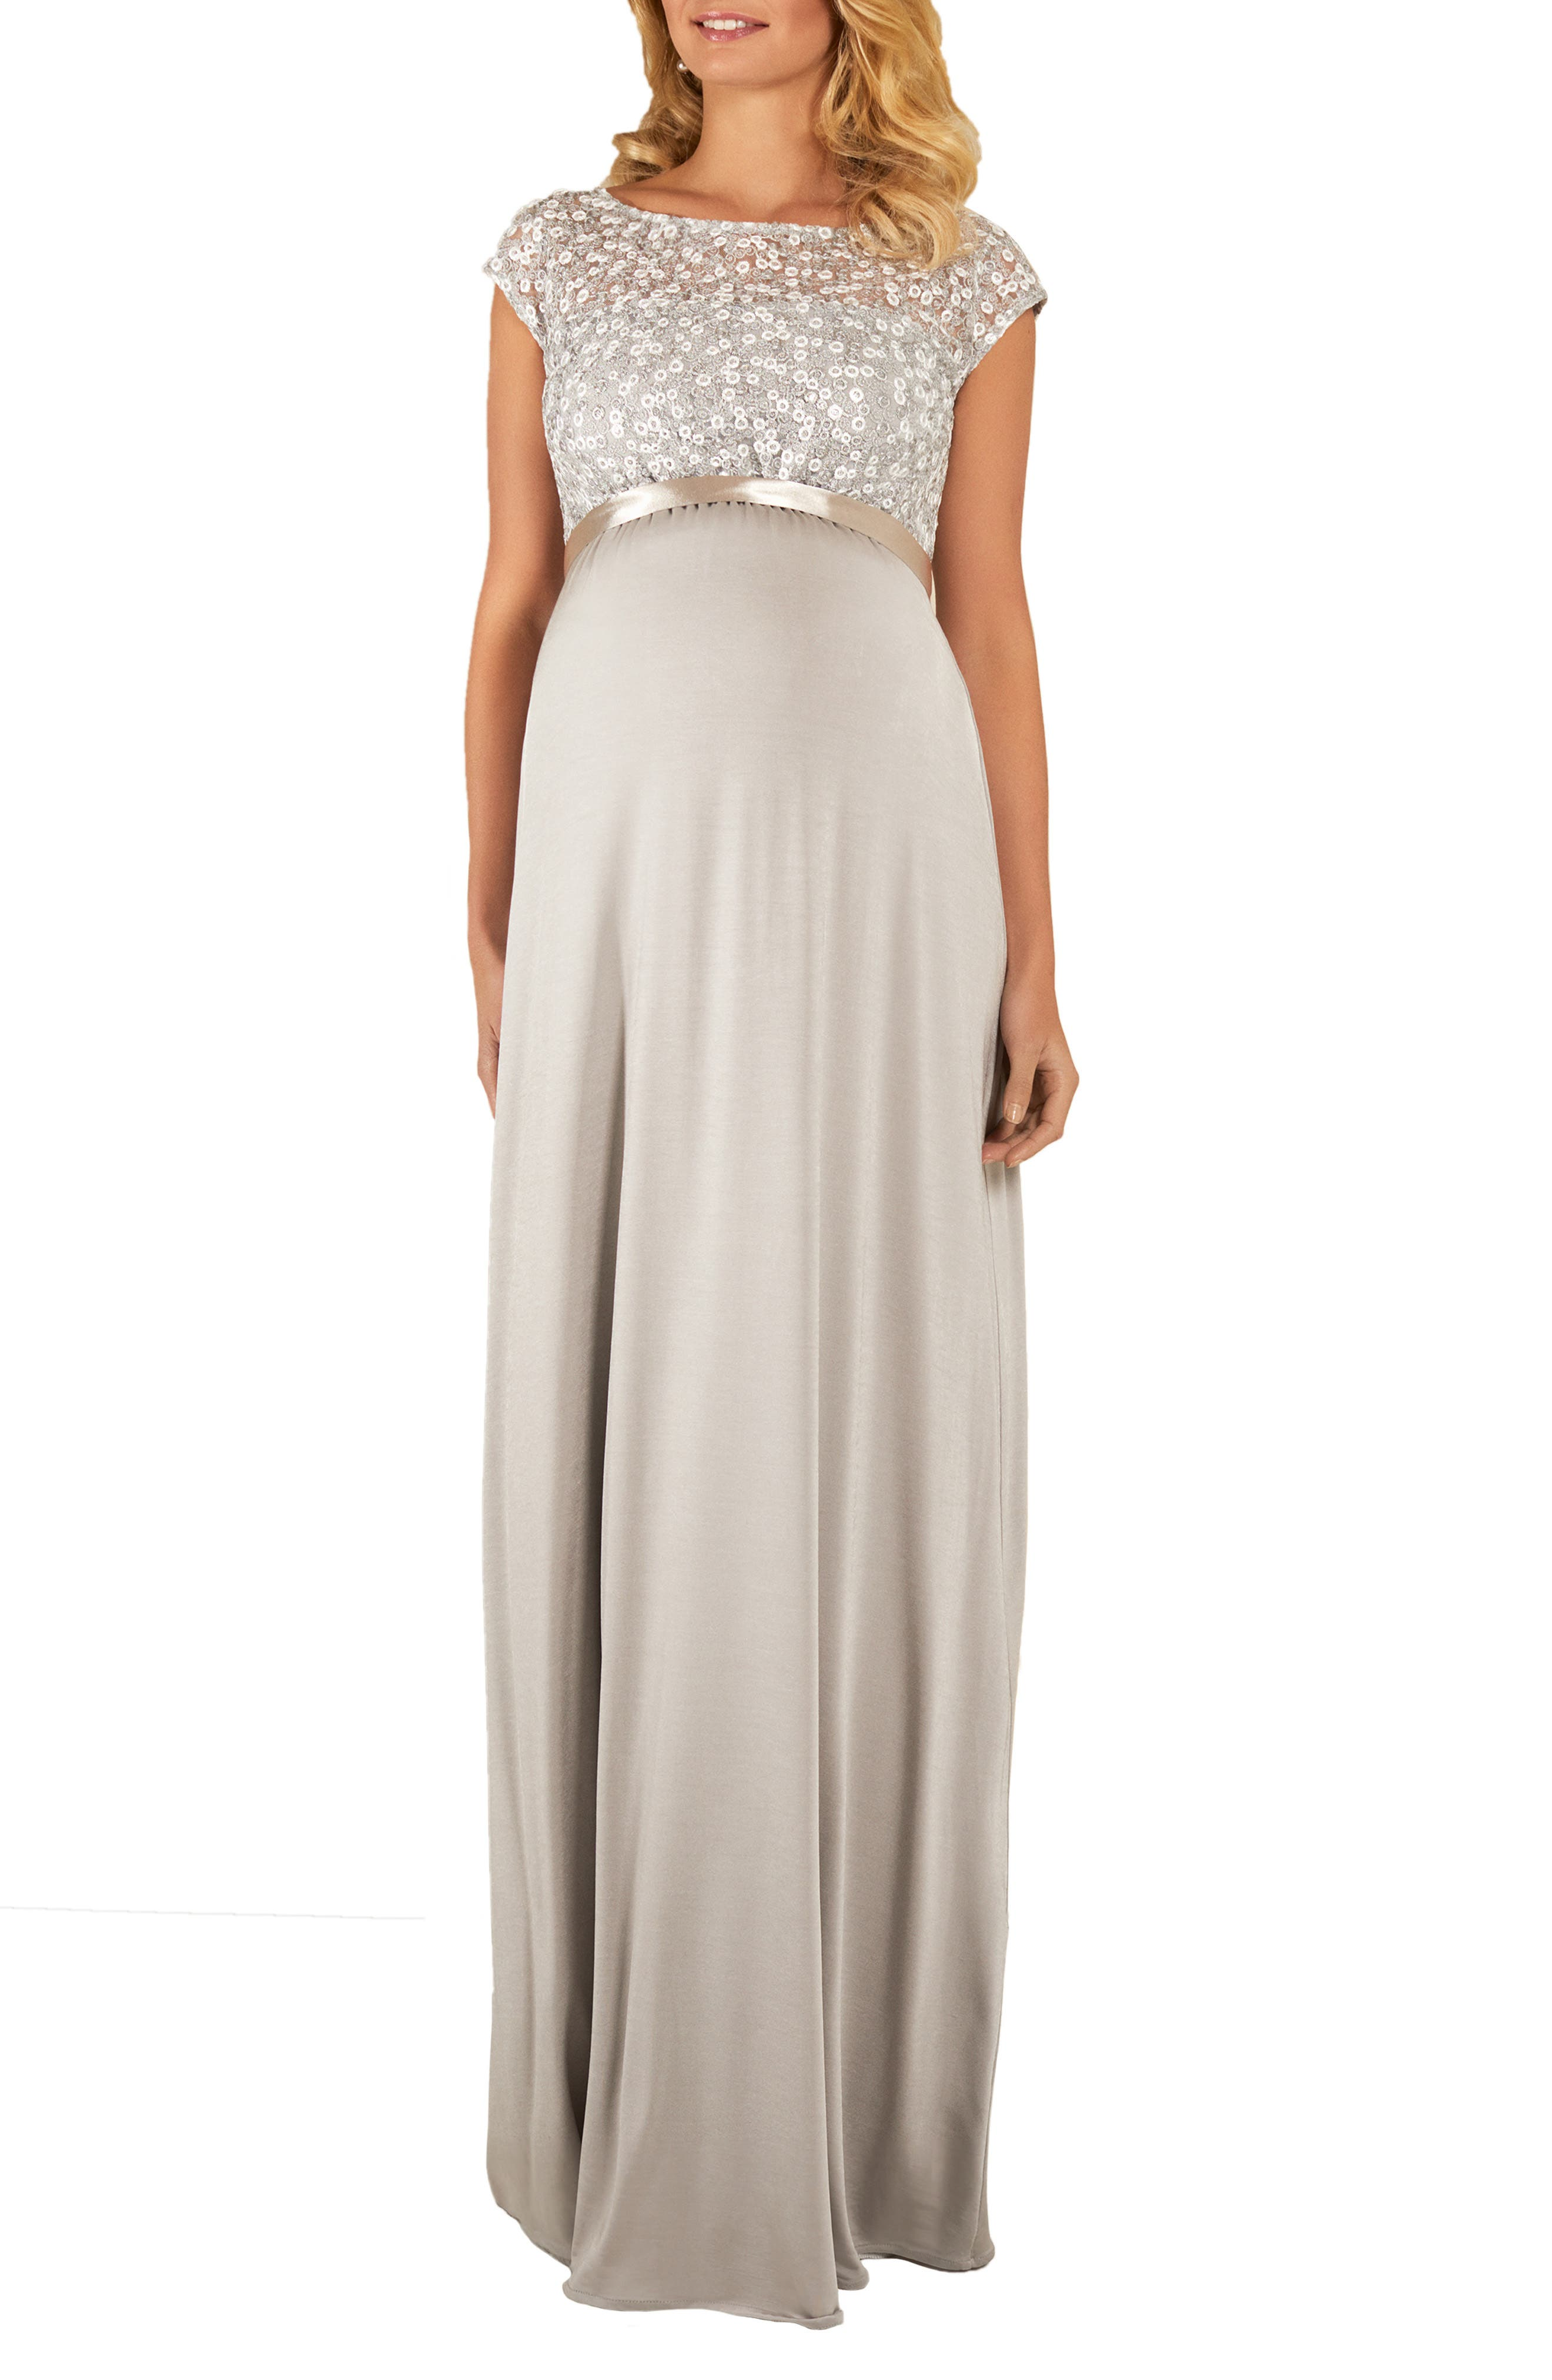 Tiffany Rose Mia Maternity Gown, Metallic